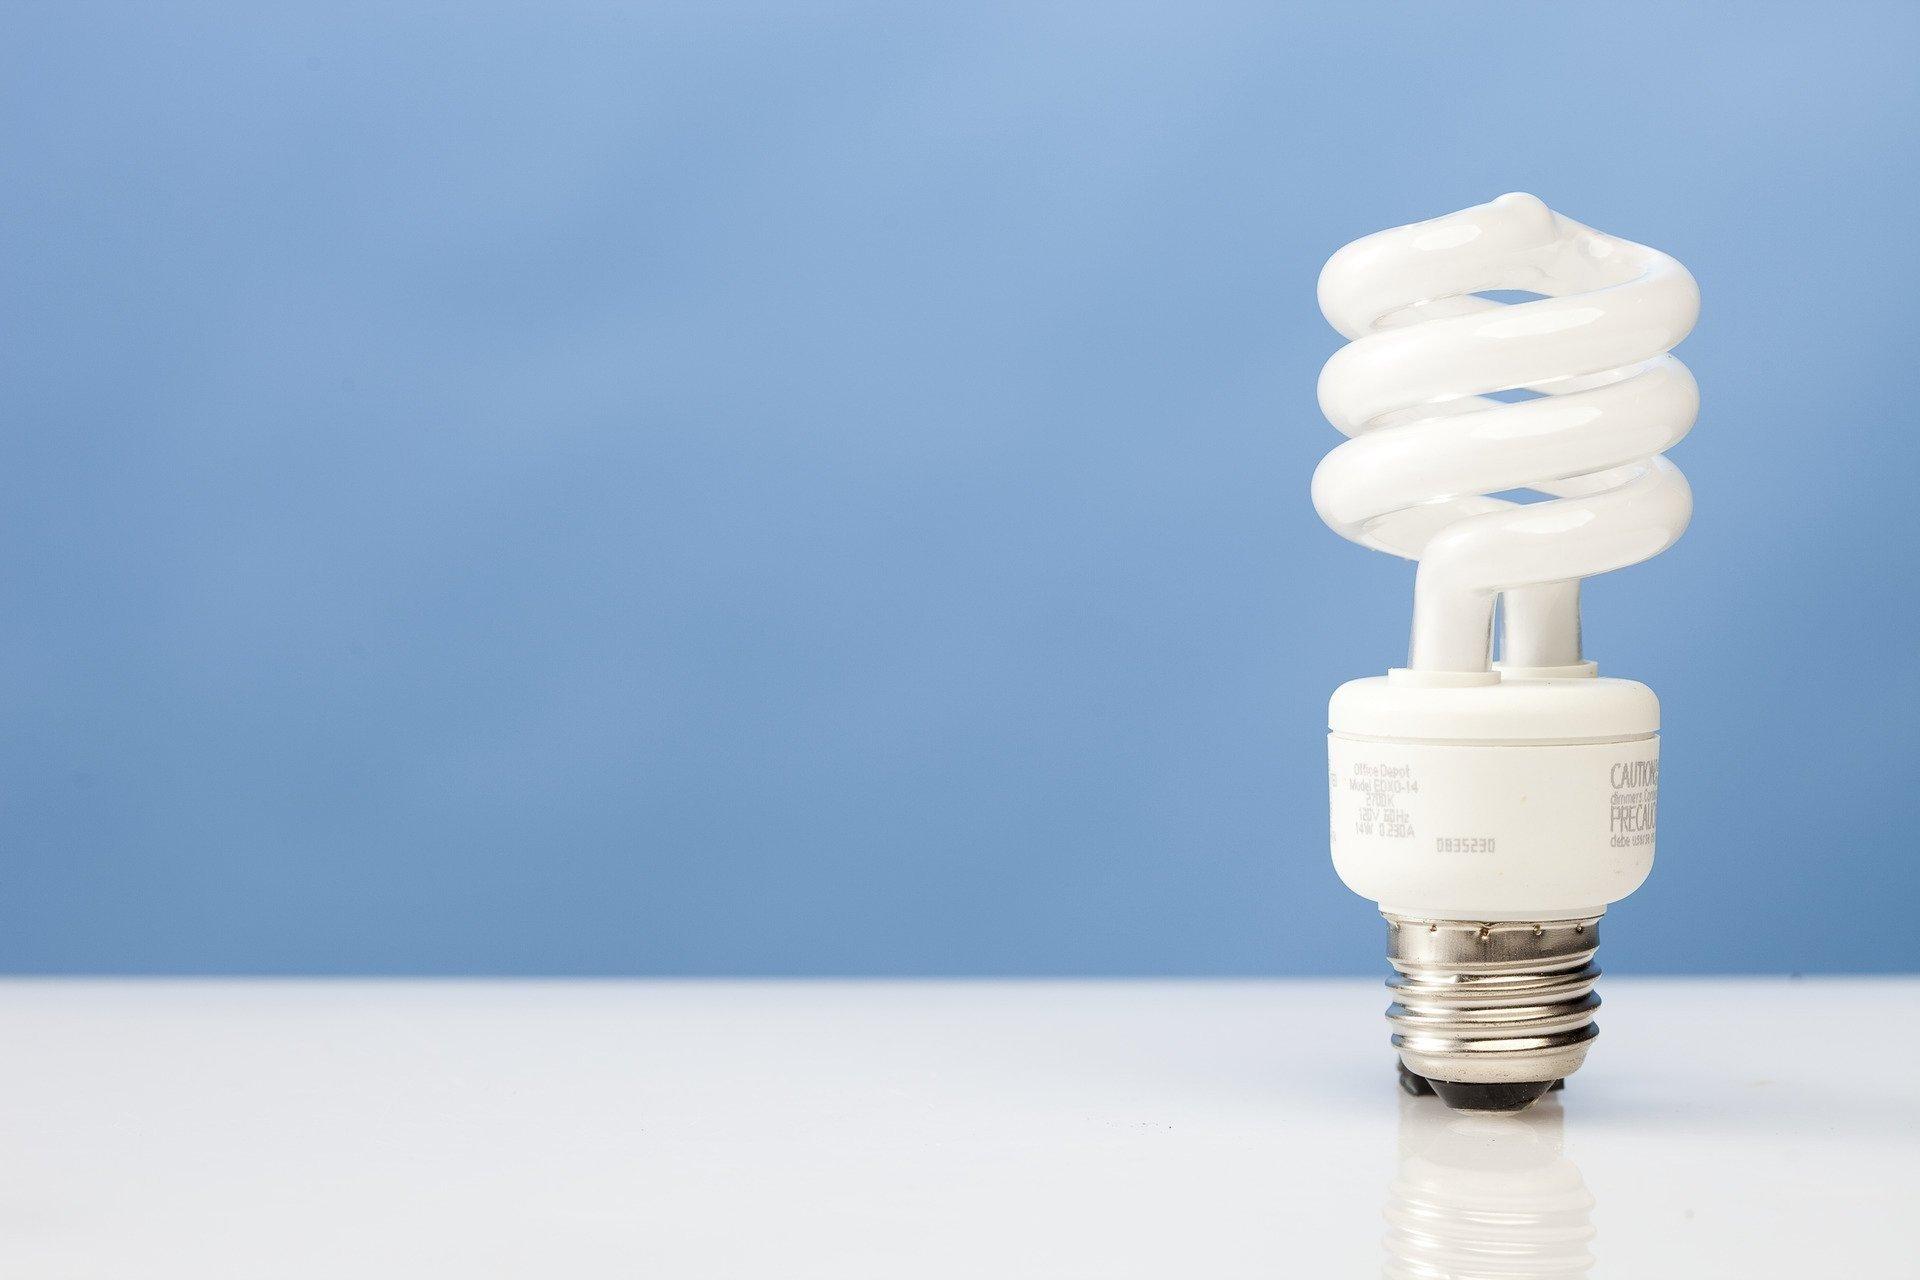 GE wants to unload its iconic light bulb business  NBC2com WBBH